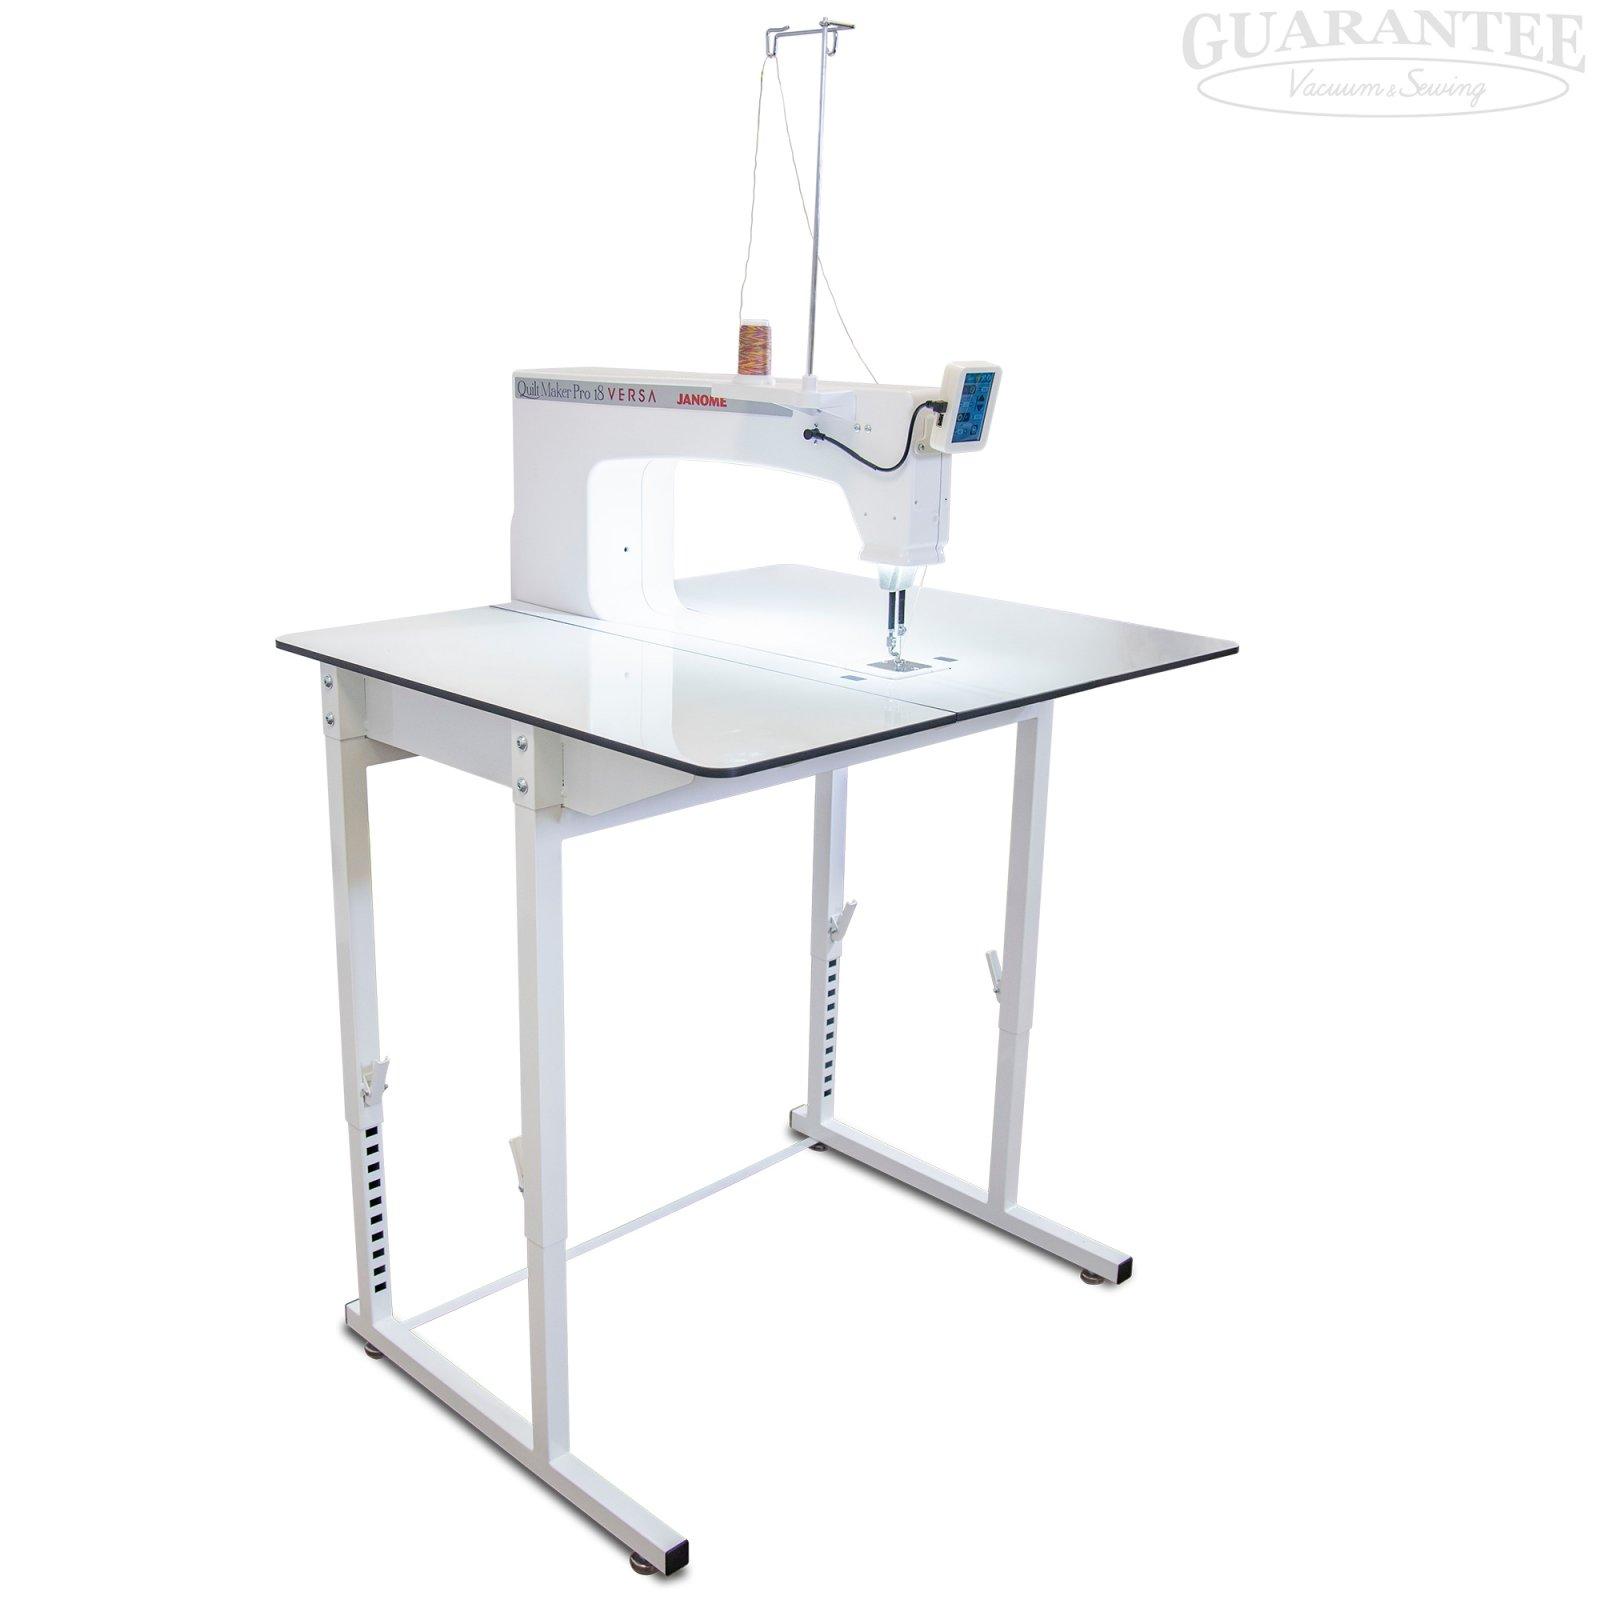 JANOME Quilt Maker Pro 18 Versa Stationary Long Arm Quilting Machine w/ Stitch Regulation